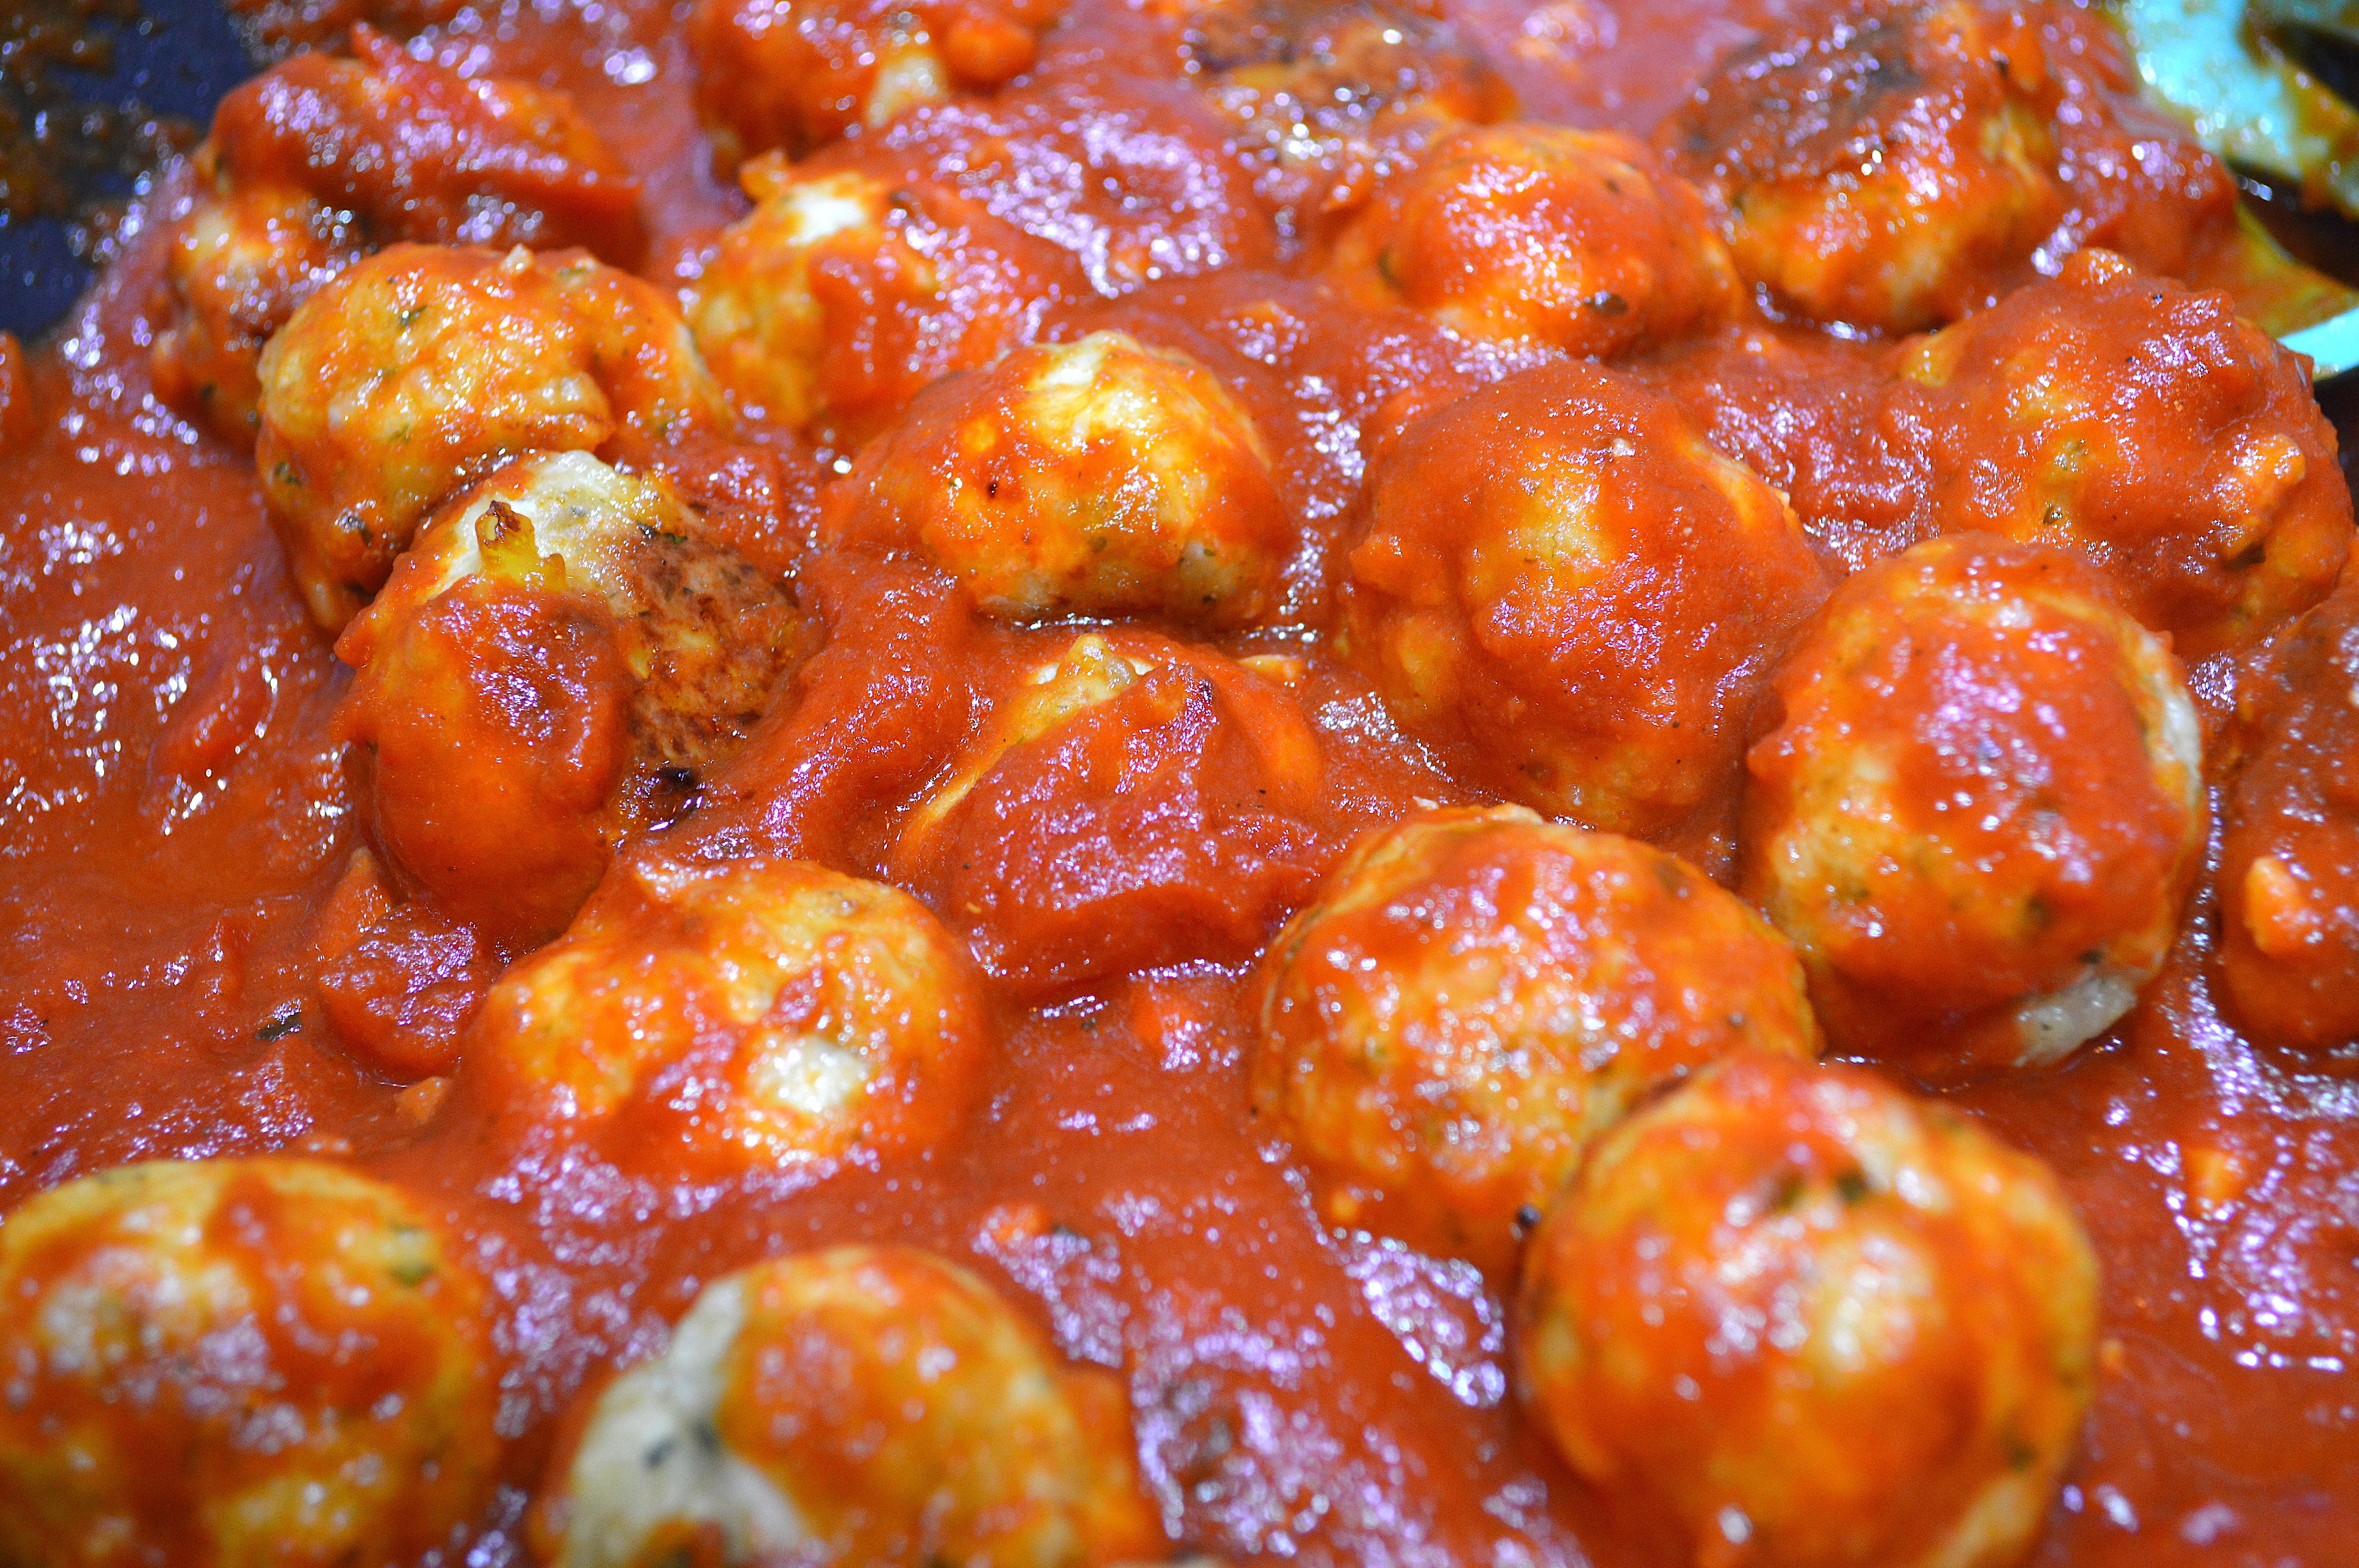 Versatile Homemade Freezable Meatballs